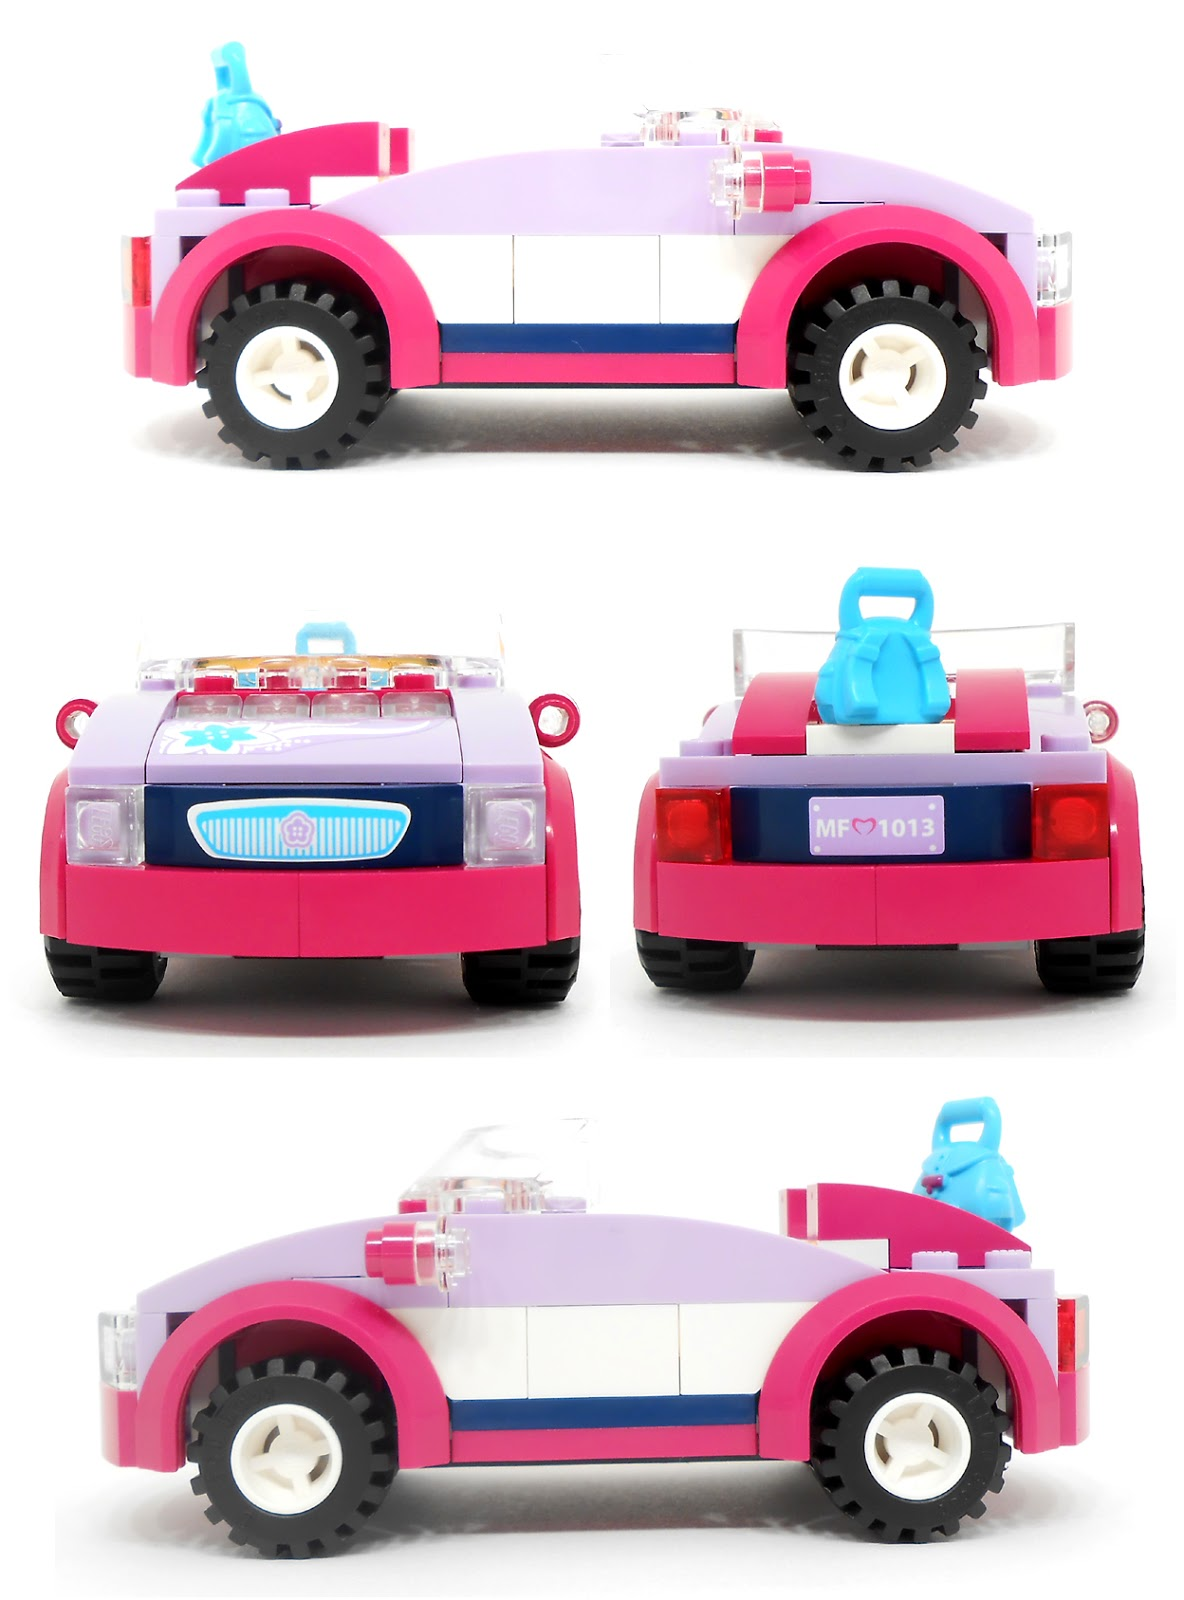 lego friends car instructions